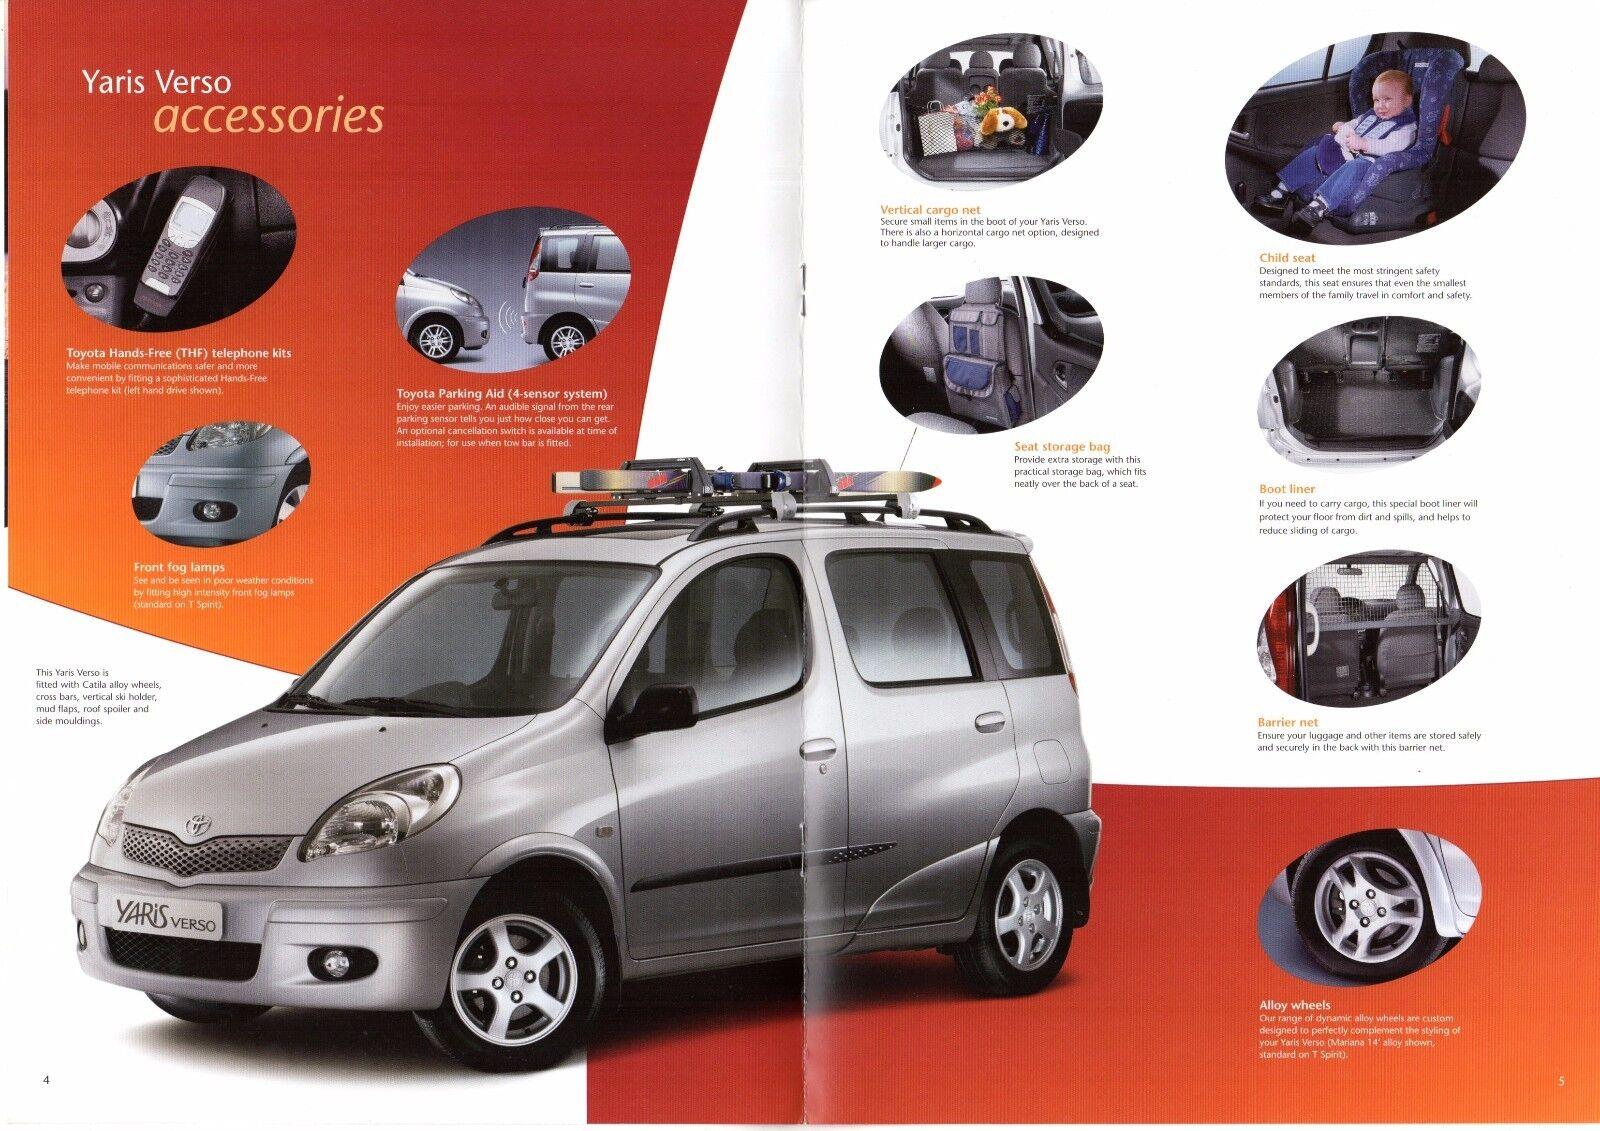 Toyota Yaris Verso Accessories 2003 05 Uk Market Sales Brochure For Sale Online